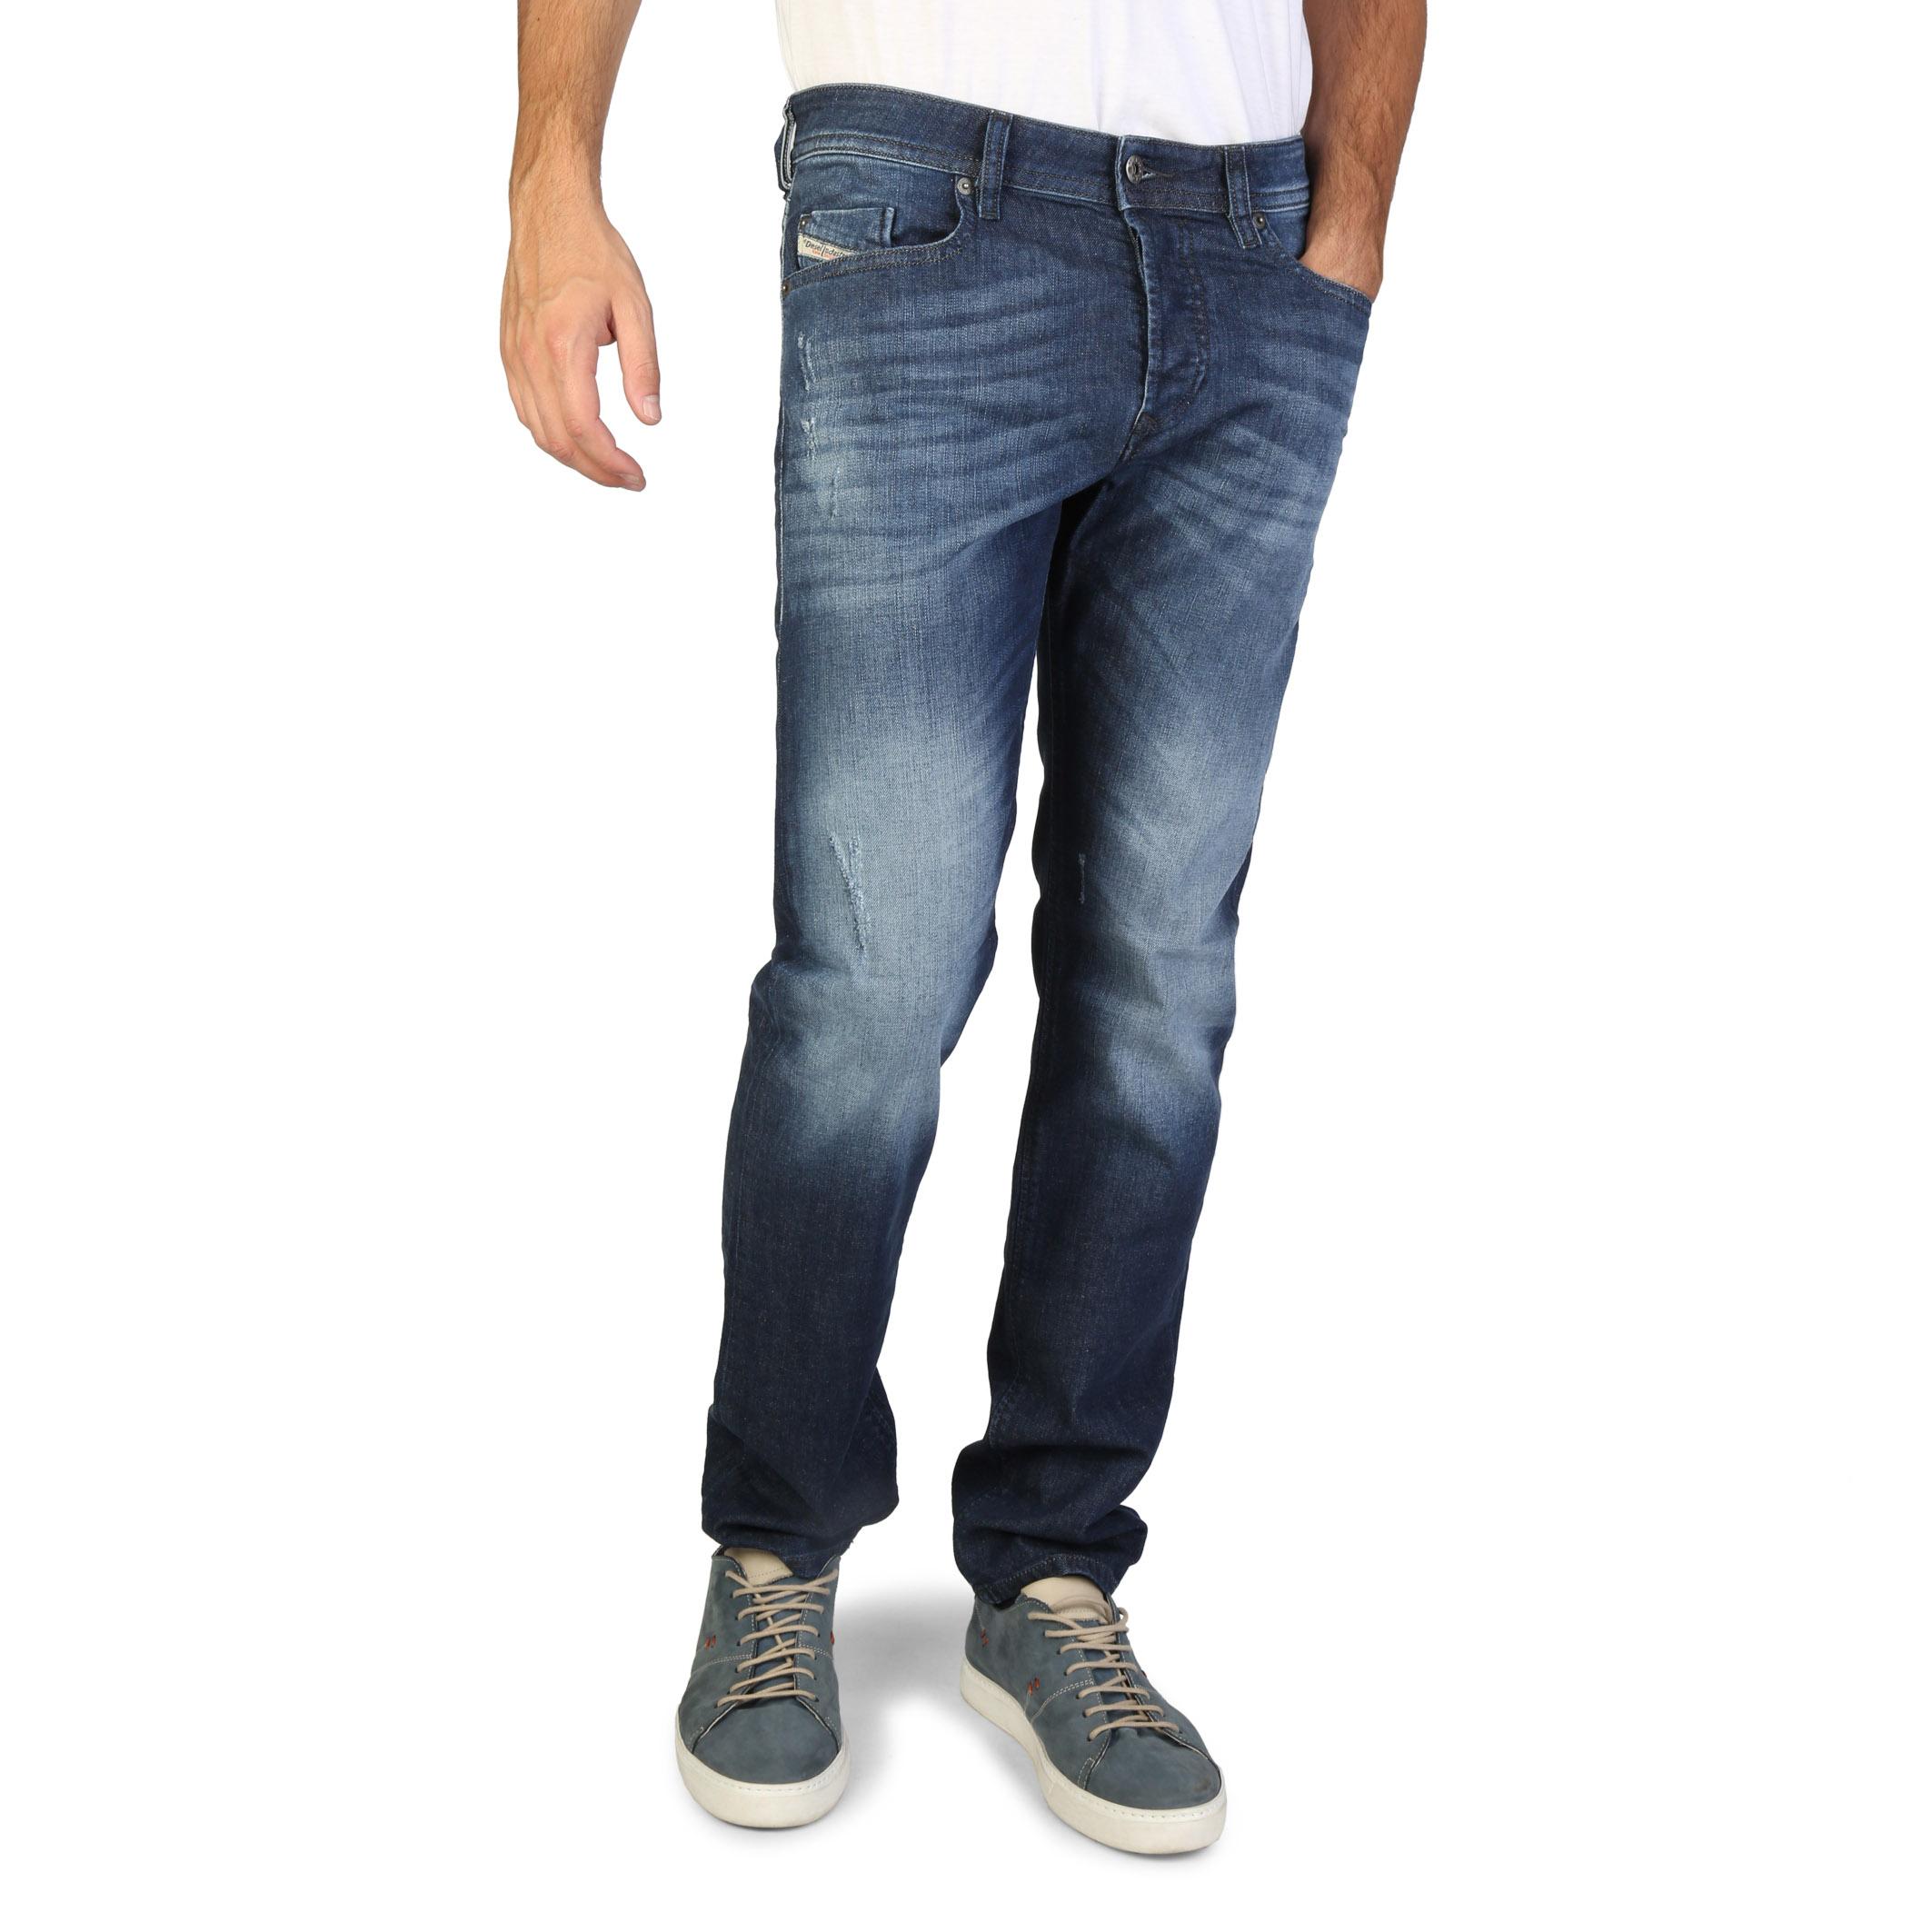 Jeans Diesel BUSTER_L32_00SDHB Uomo Blu 94893